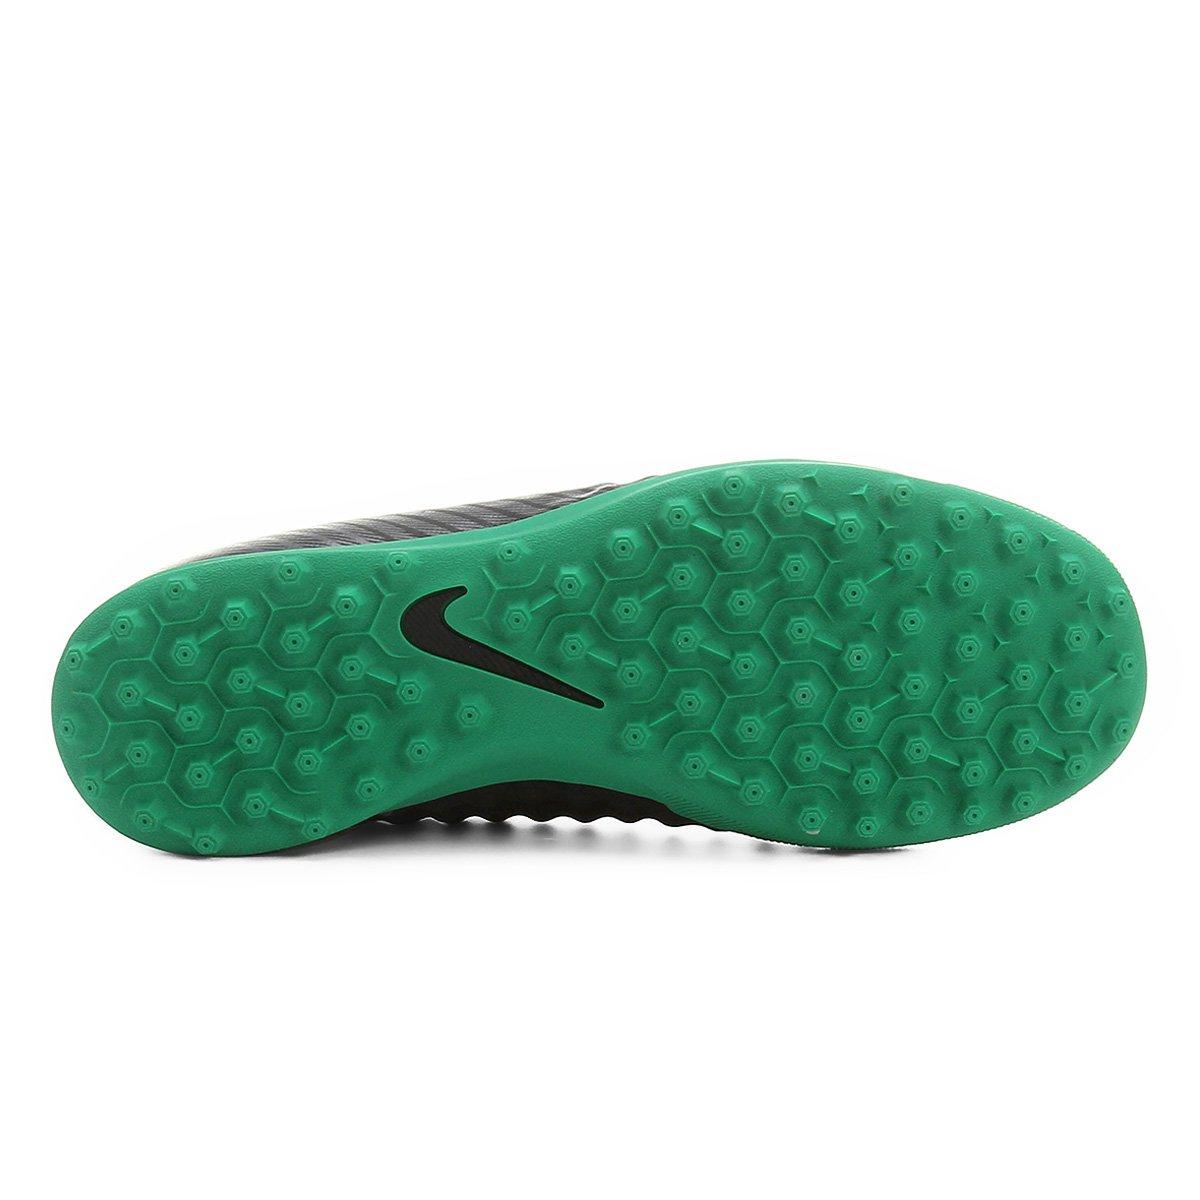 Society Masculina Preto e verde TF Chuteira Ola Nike Magista II qOwBdRTYRx